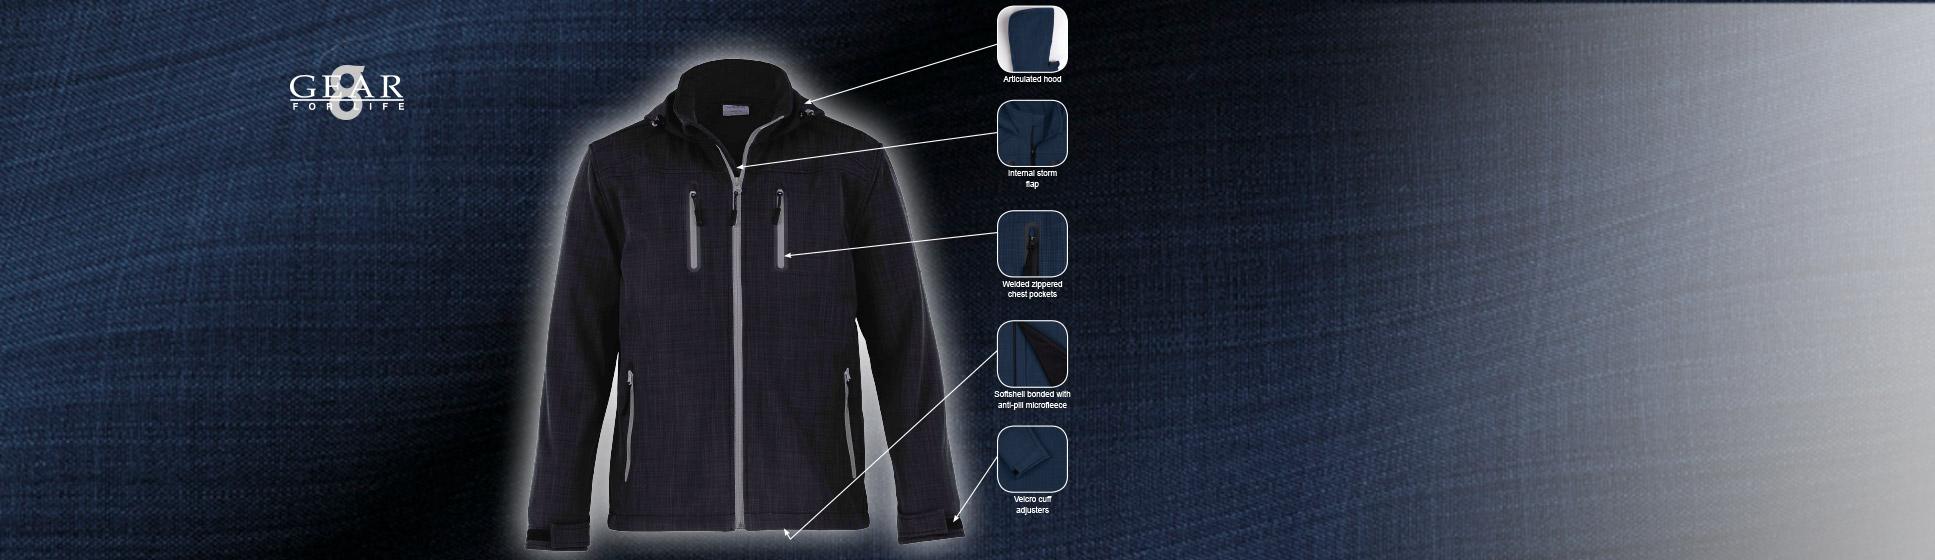 Hybrid-Jacket-Slider